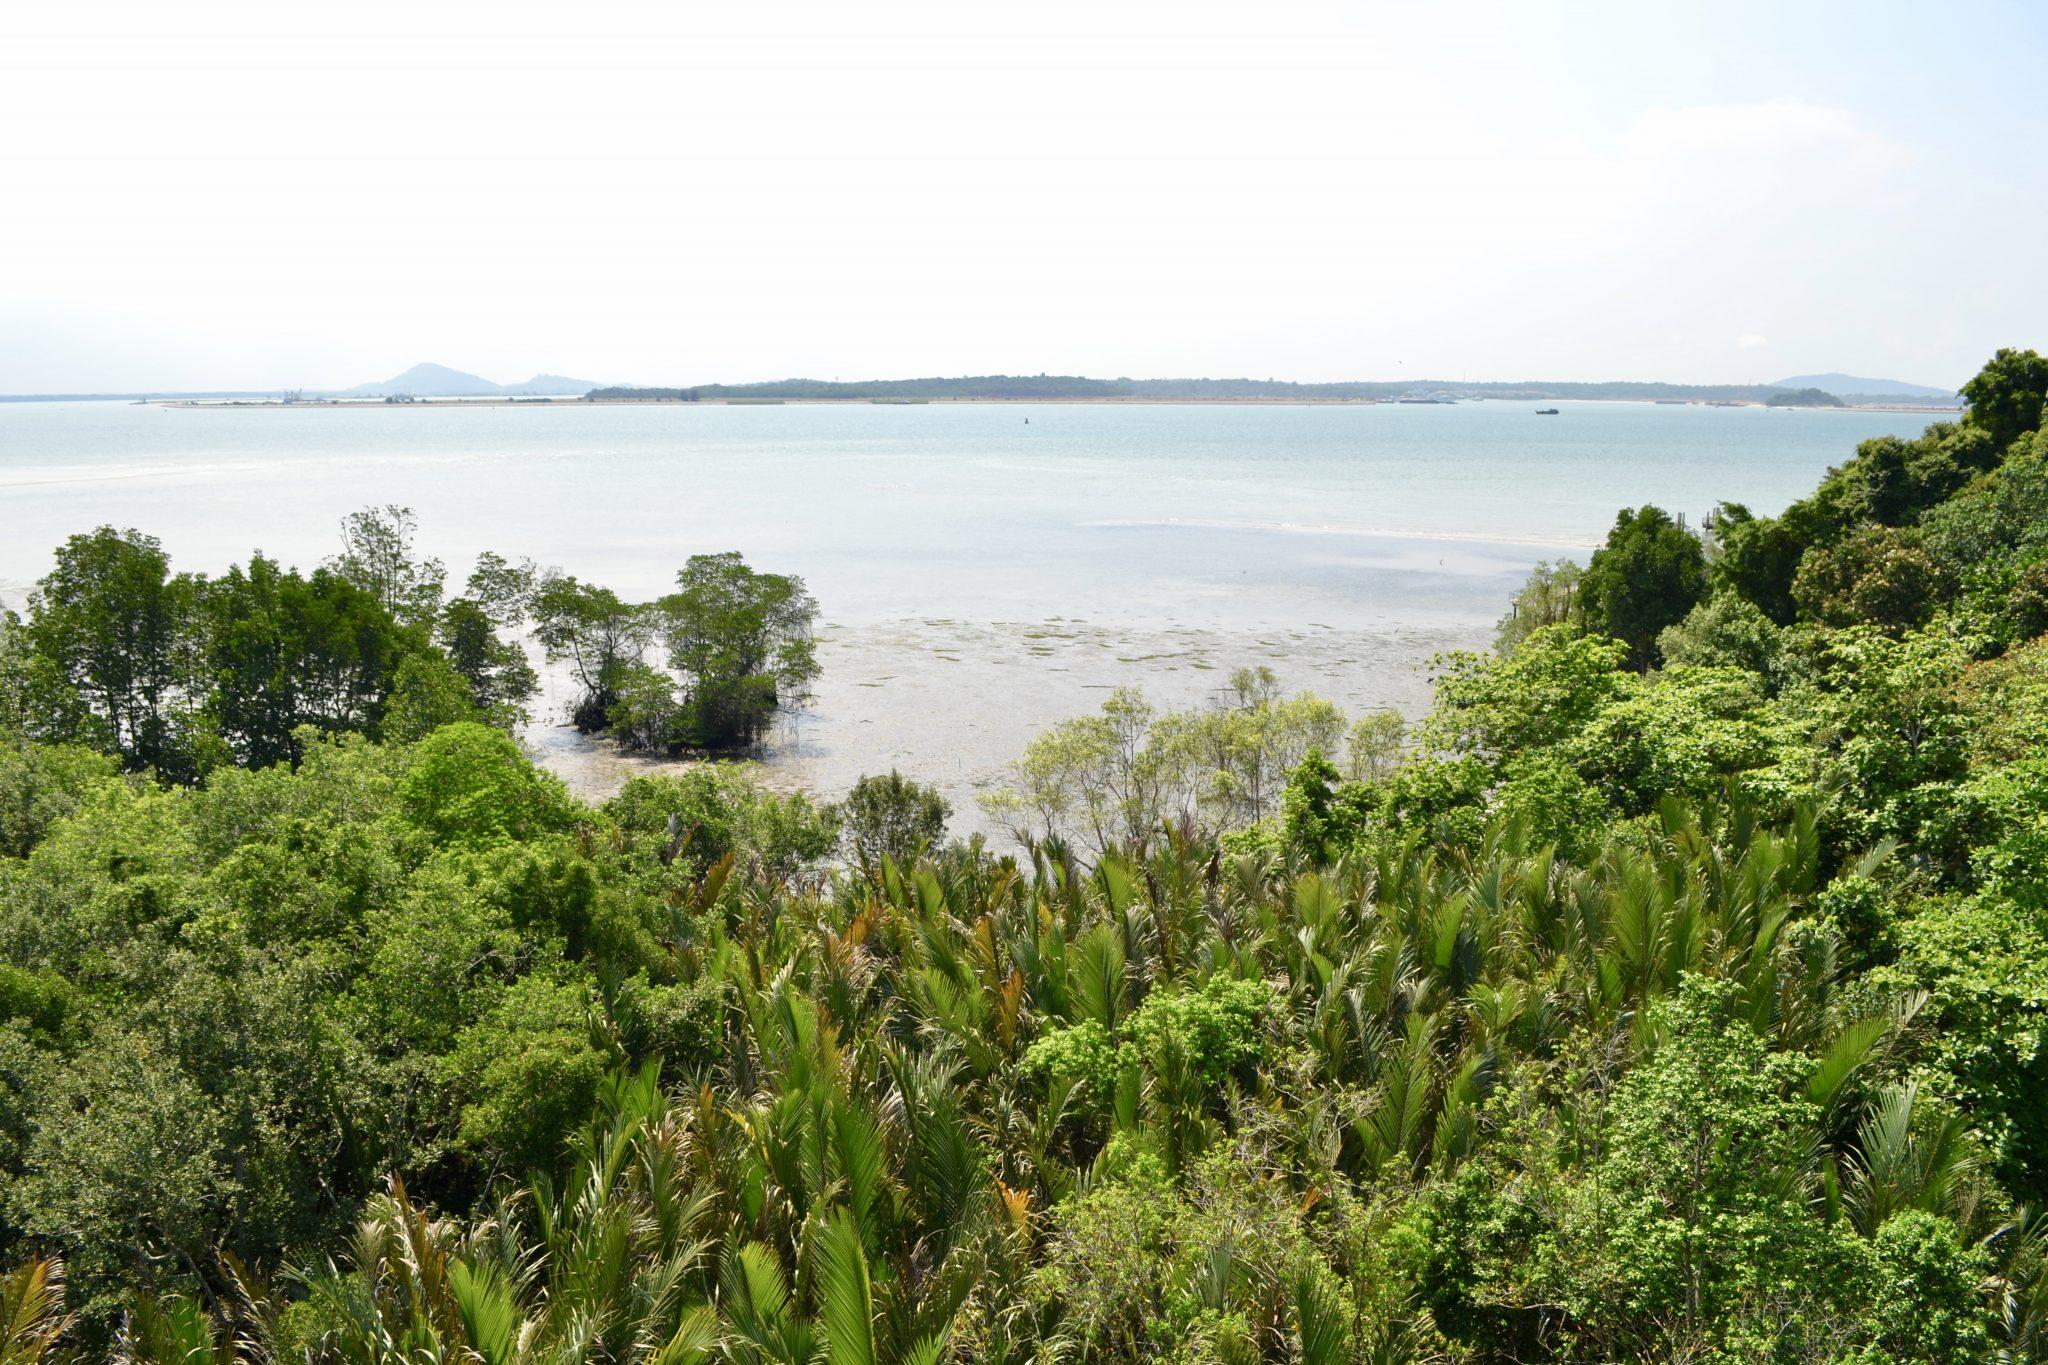 Pulau Ubin Aussicht